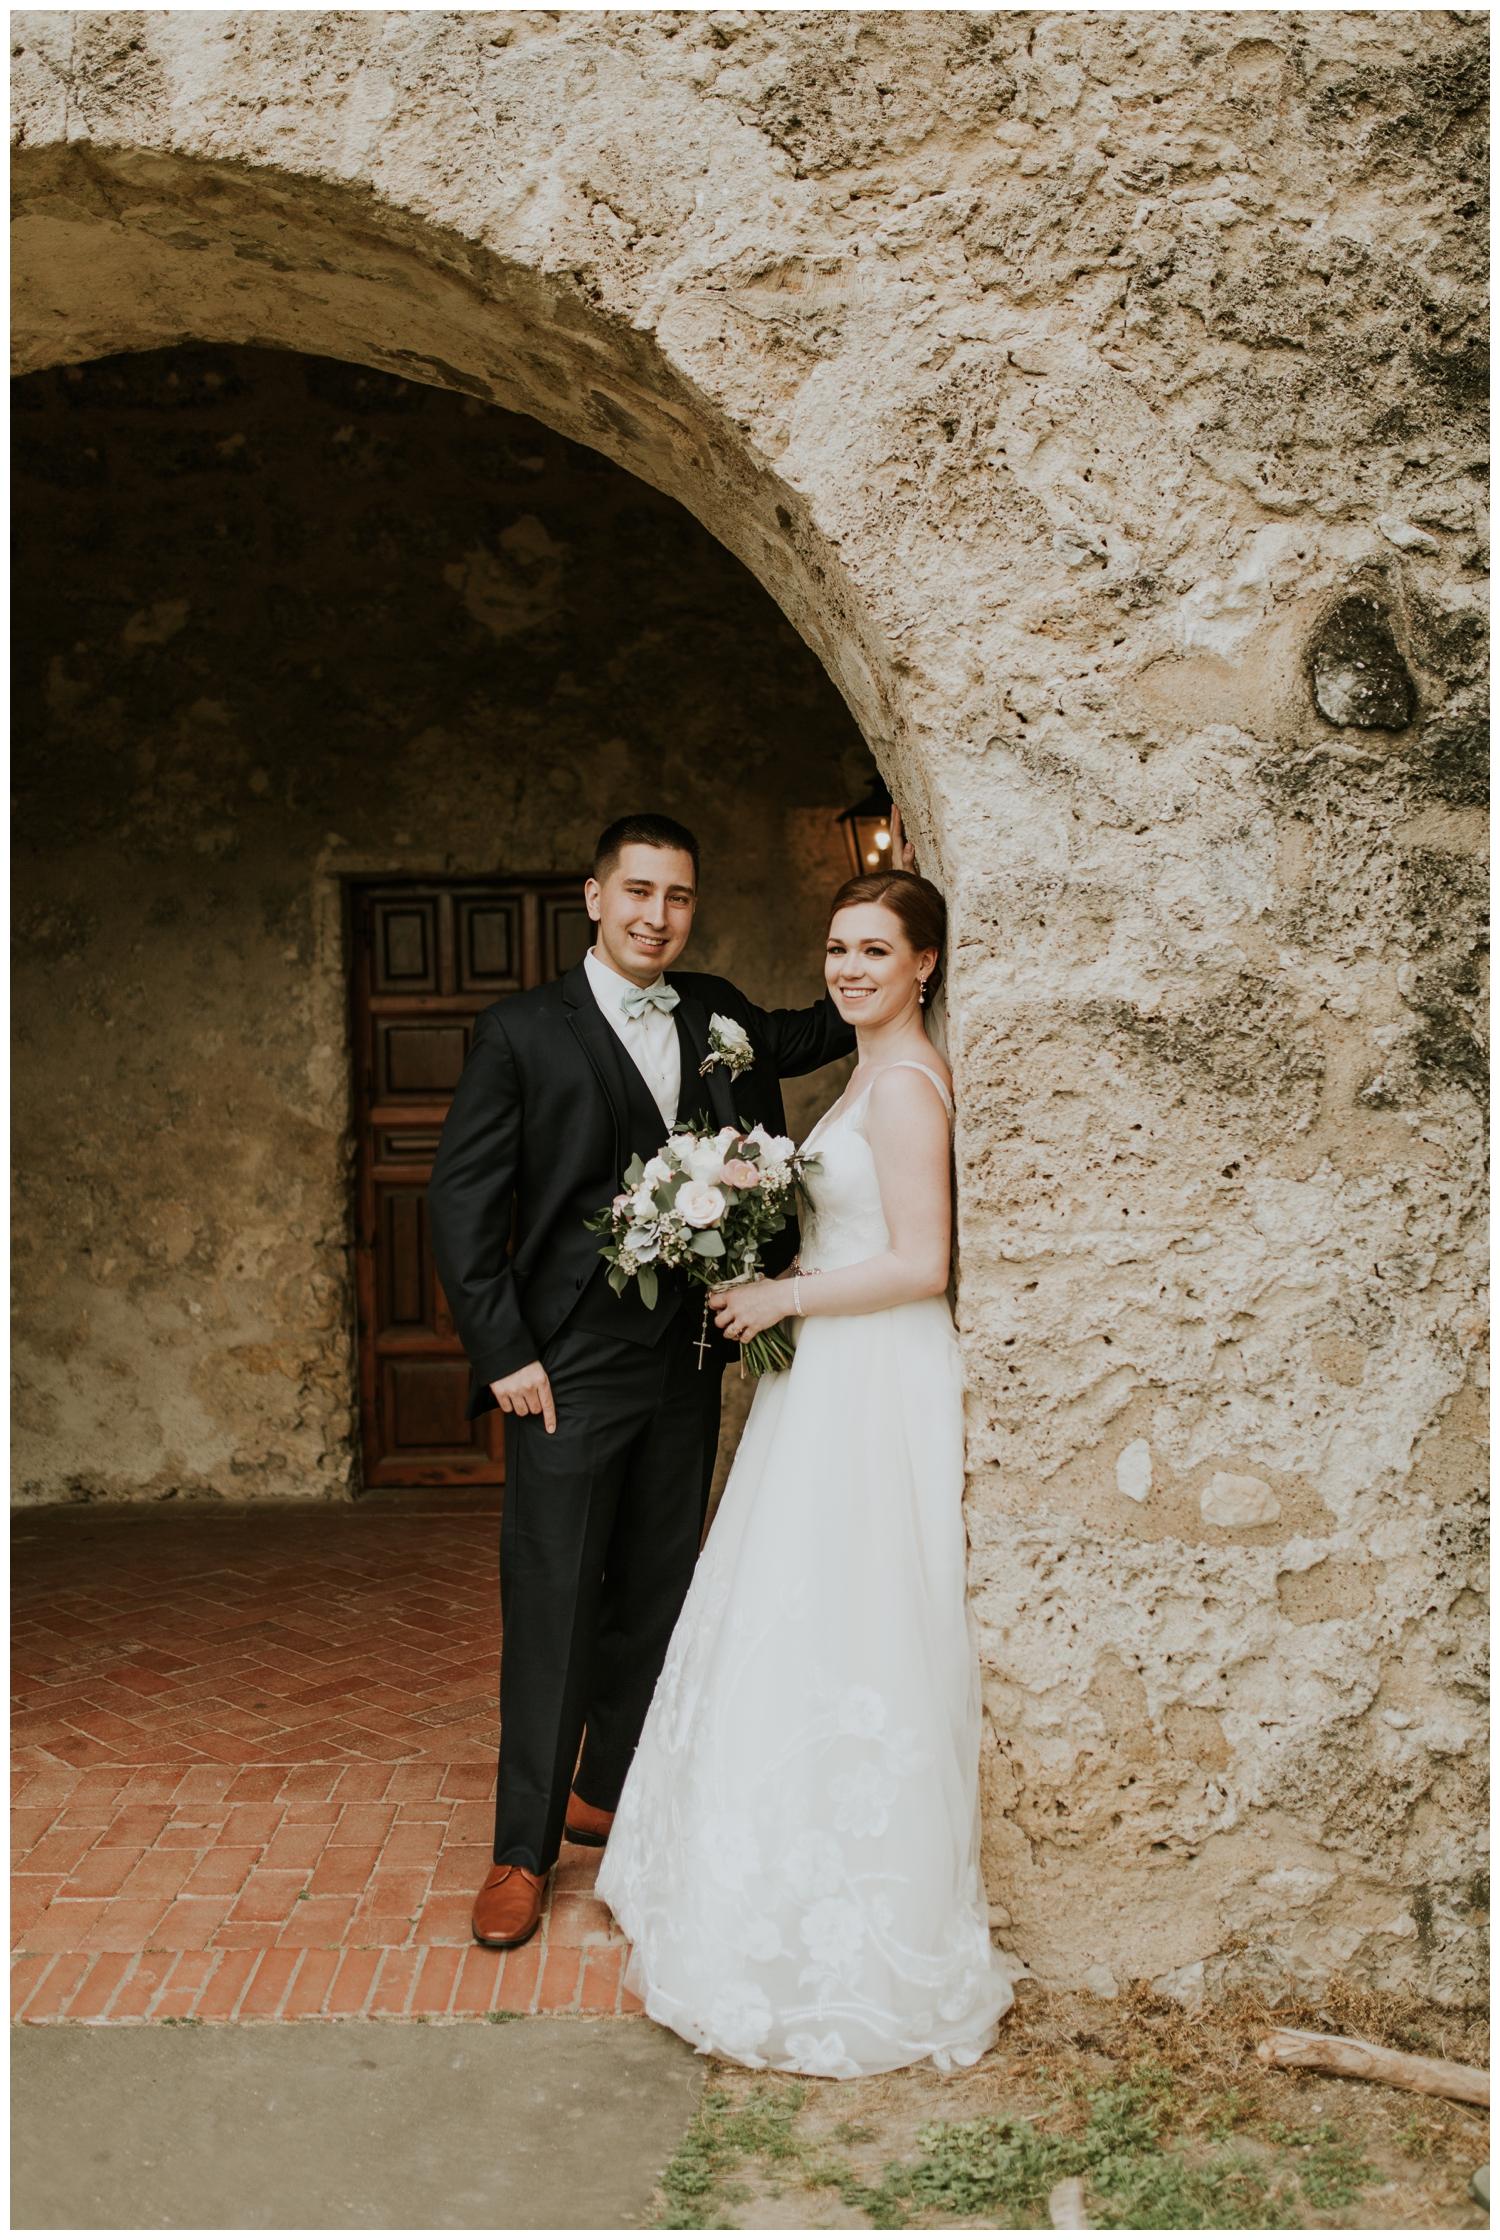 Jenna+Brandon, Mission Concepcion Wedding, San Antonio, Contista Productions Wedding Photography_0074.jpg